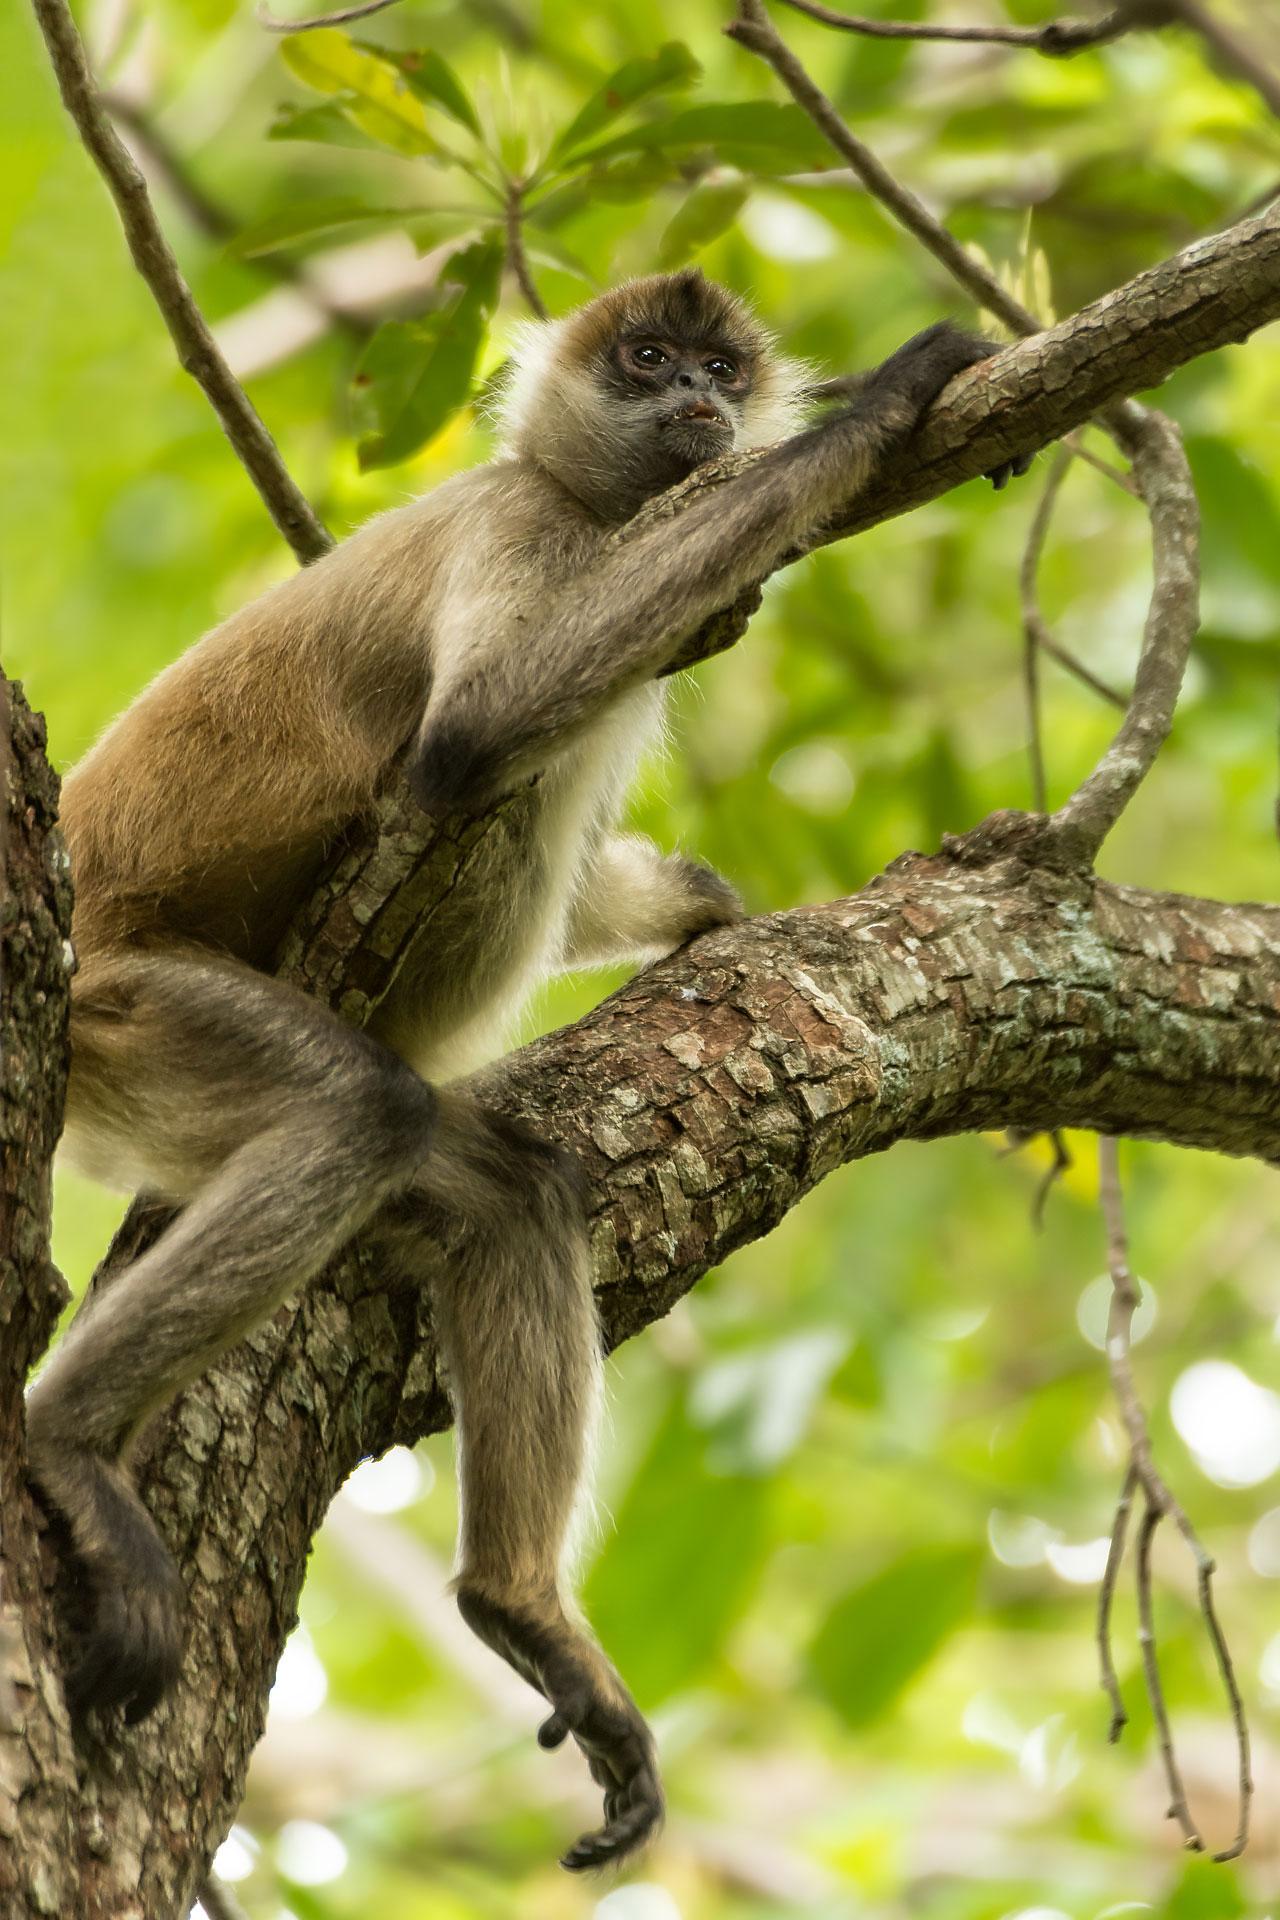 Geoffroy's Spider Monkey  (Ateles geoffroyi) - Rincon de La Vieja, Costa Rica  Nikon D7200 + Nikon 200-400mm f4 VR1 @ ISO 800